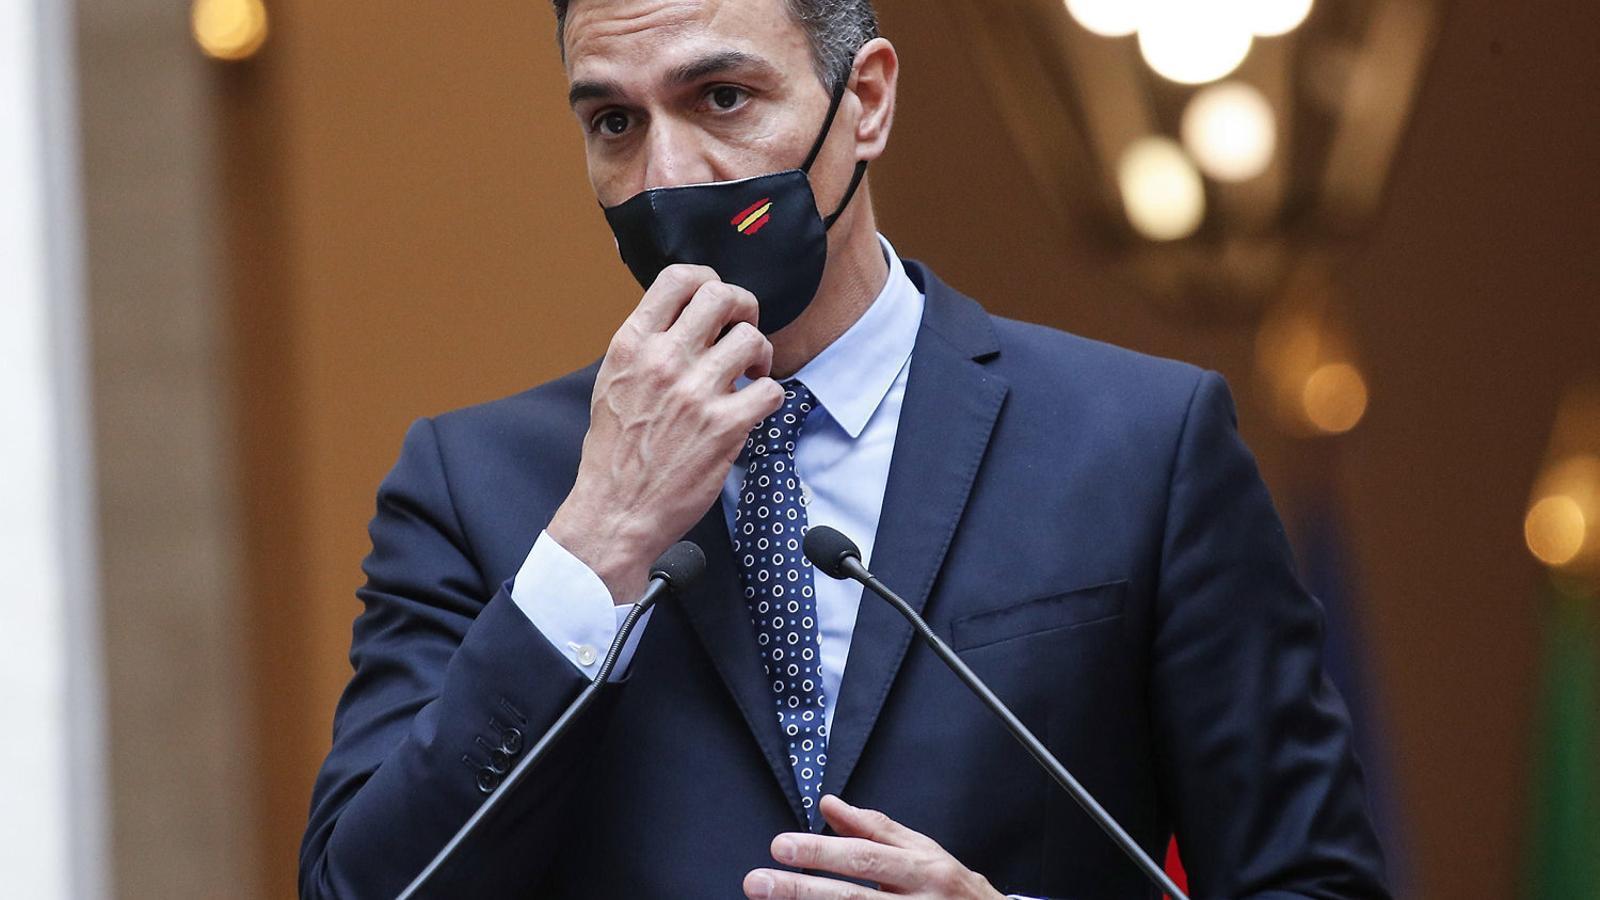 El president espanyol, Pedro Sánchez, ahir en roda de premsa a Roma.